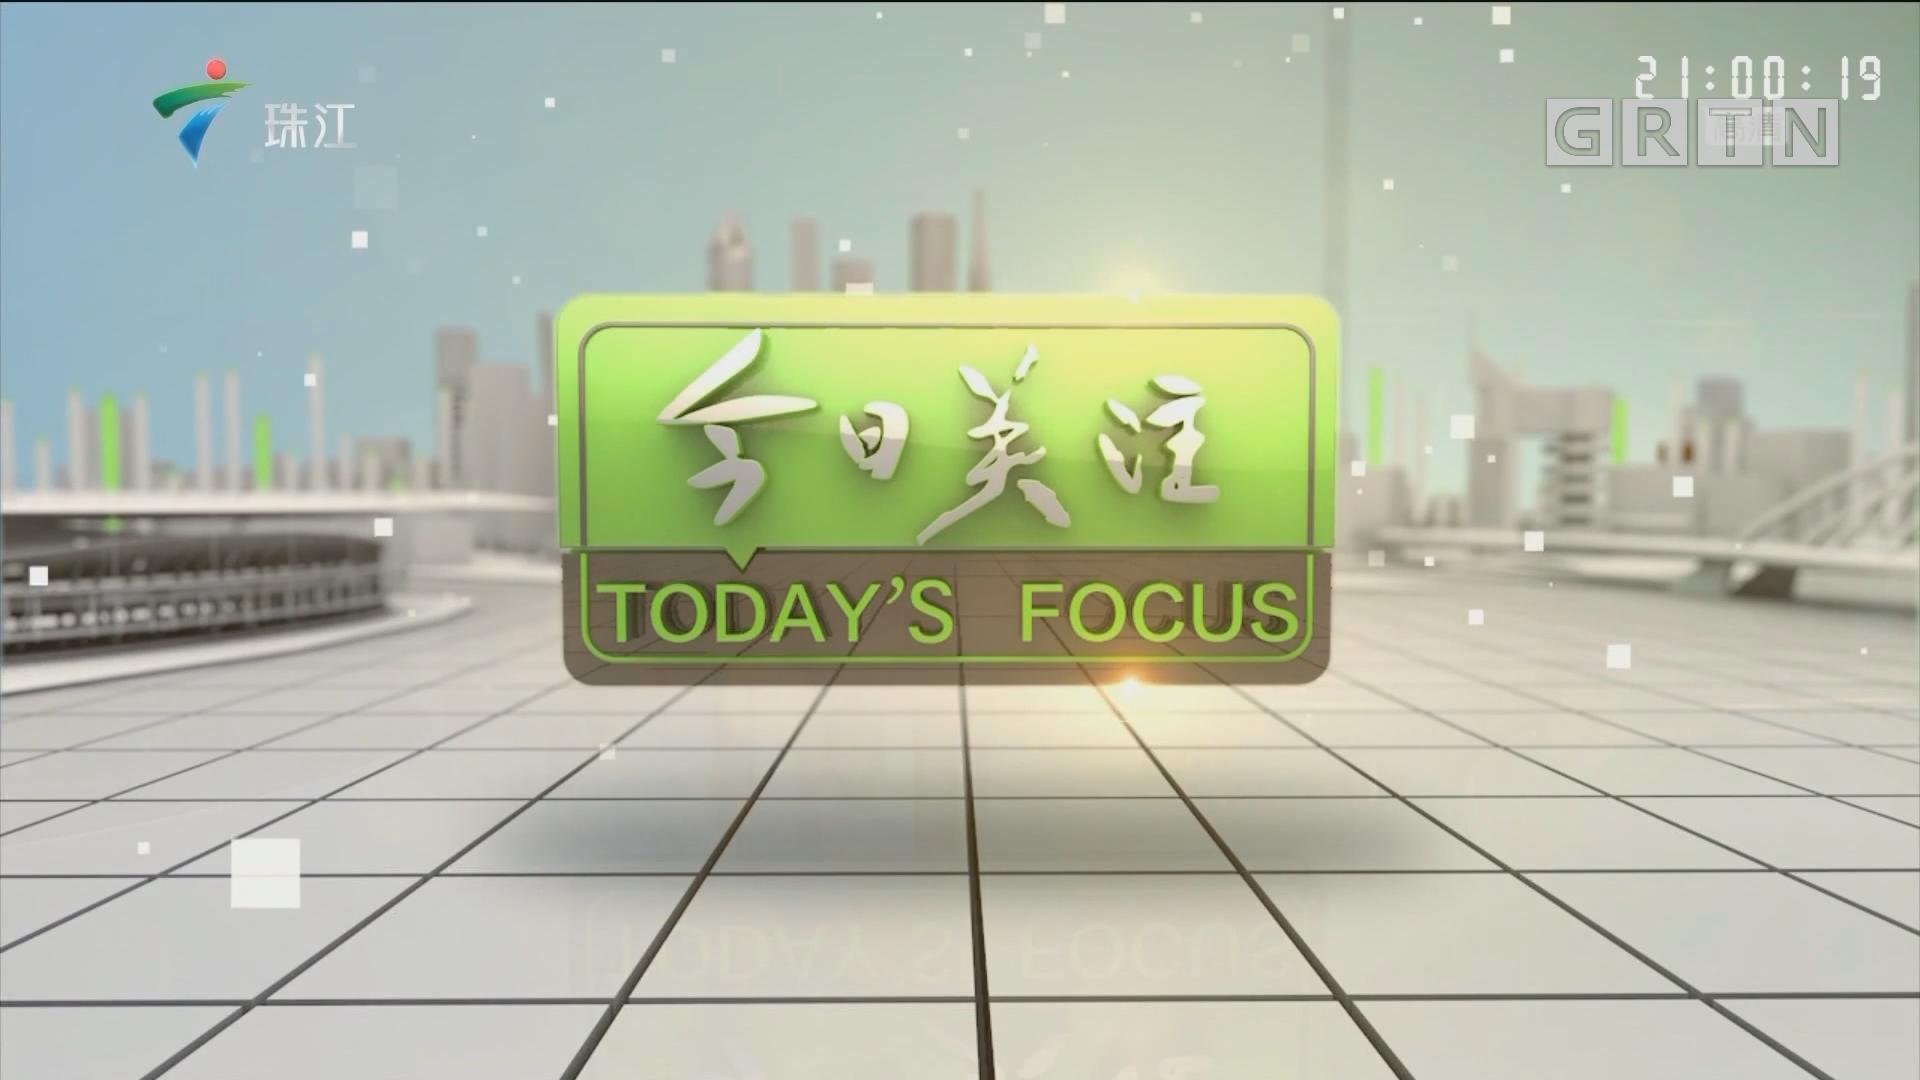 [HD][2019-04-05]今日關注:廣州:墓園周邊停車位緊張 建議乘公交出行